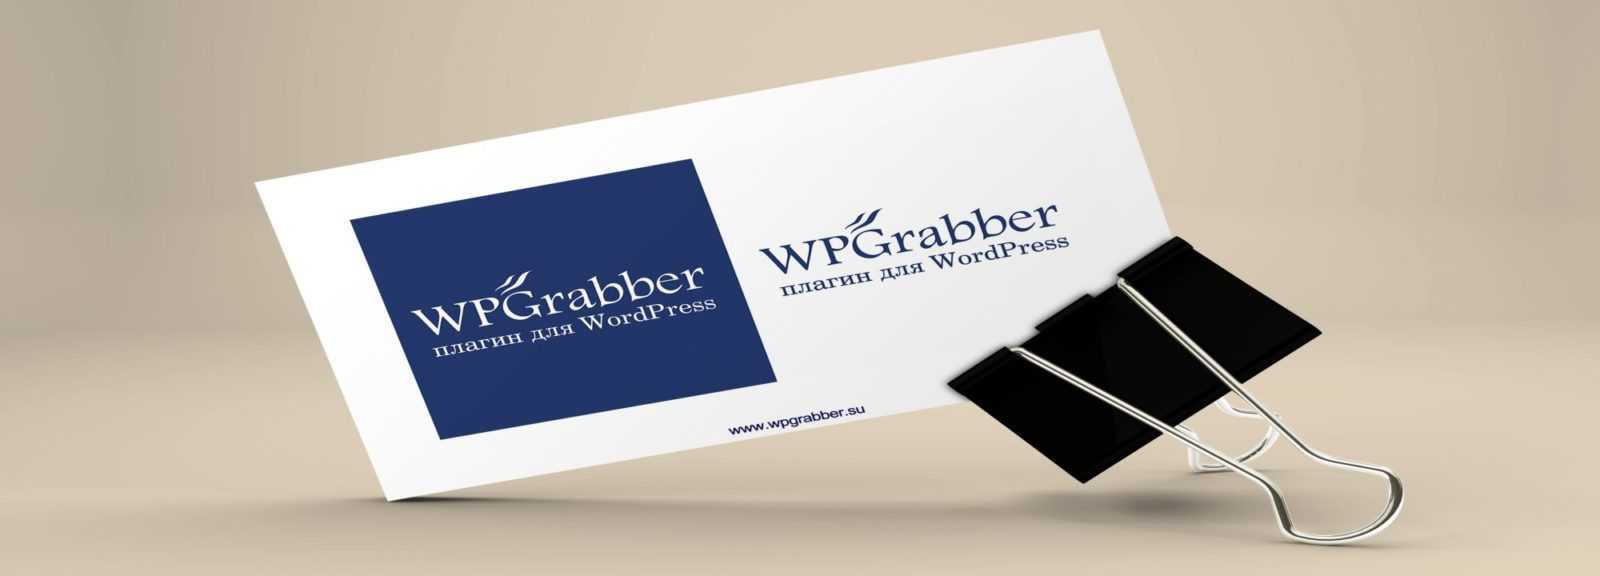 Плагин WPGrabber 3.х.х Pro + Премиум доступ + 5 настроенных лент